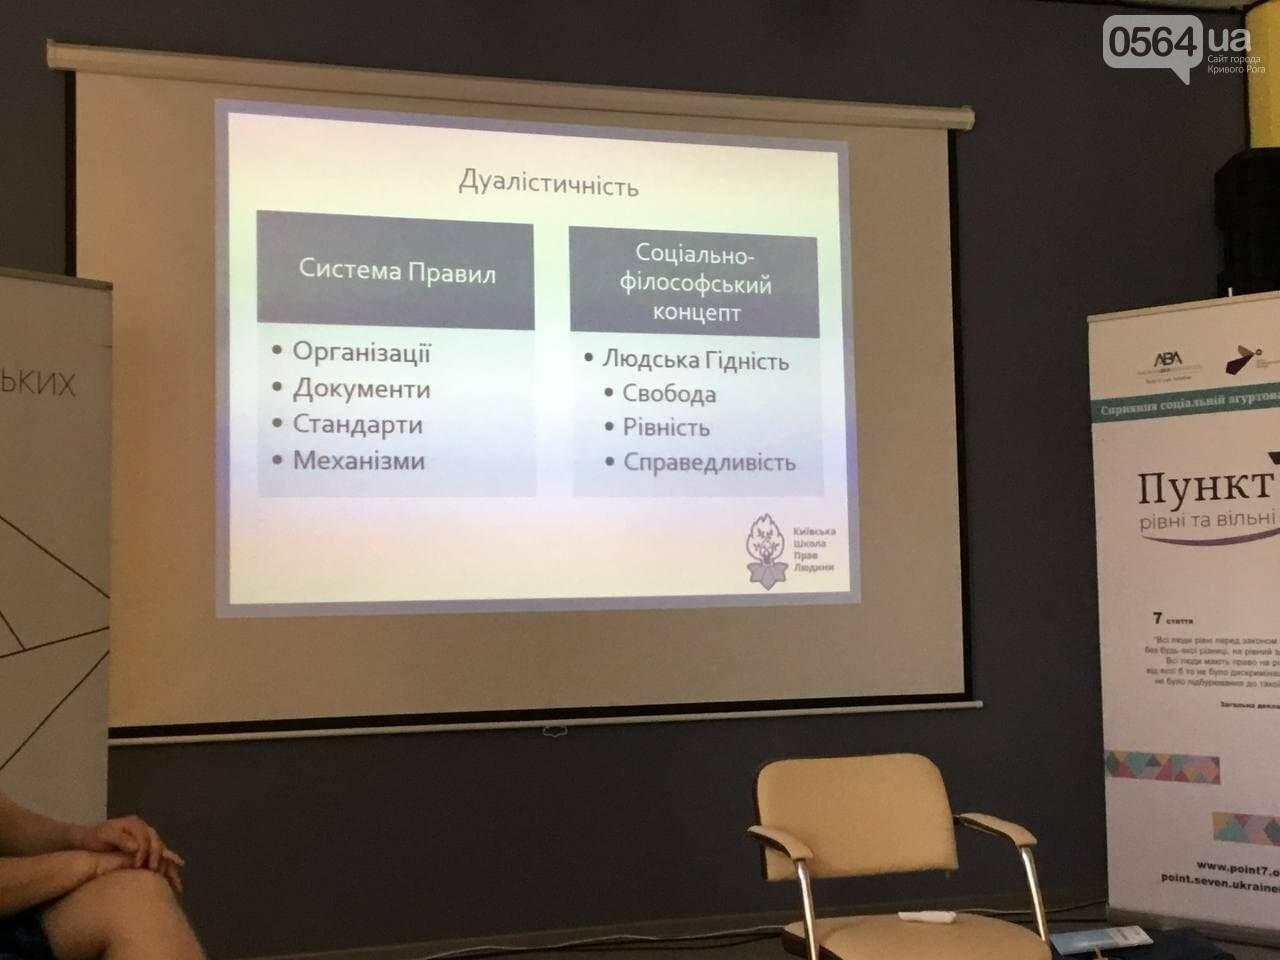 Криворожанам прочитали лекции о гендерном (не) равенстве и правах человека, - ФОТО, ВИДЕО, фото-7